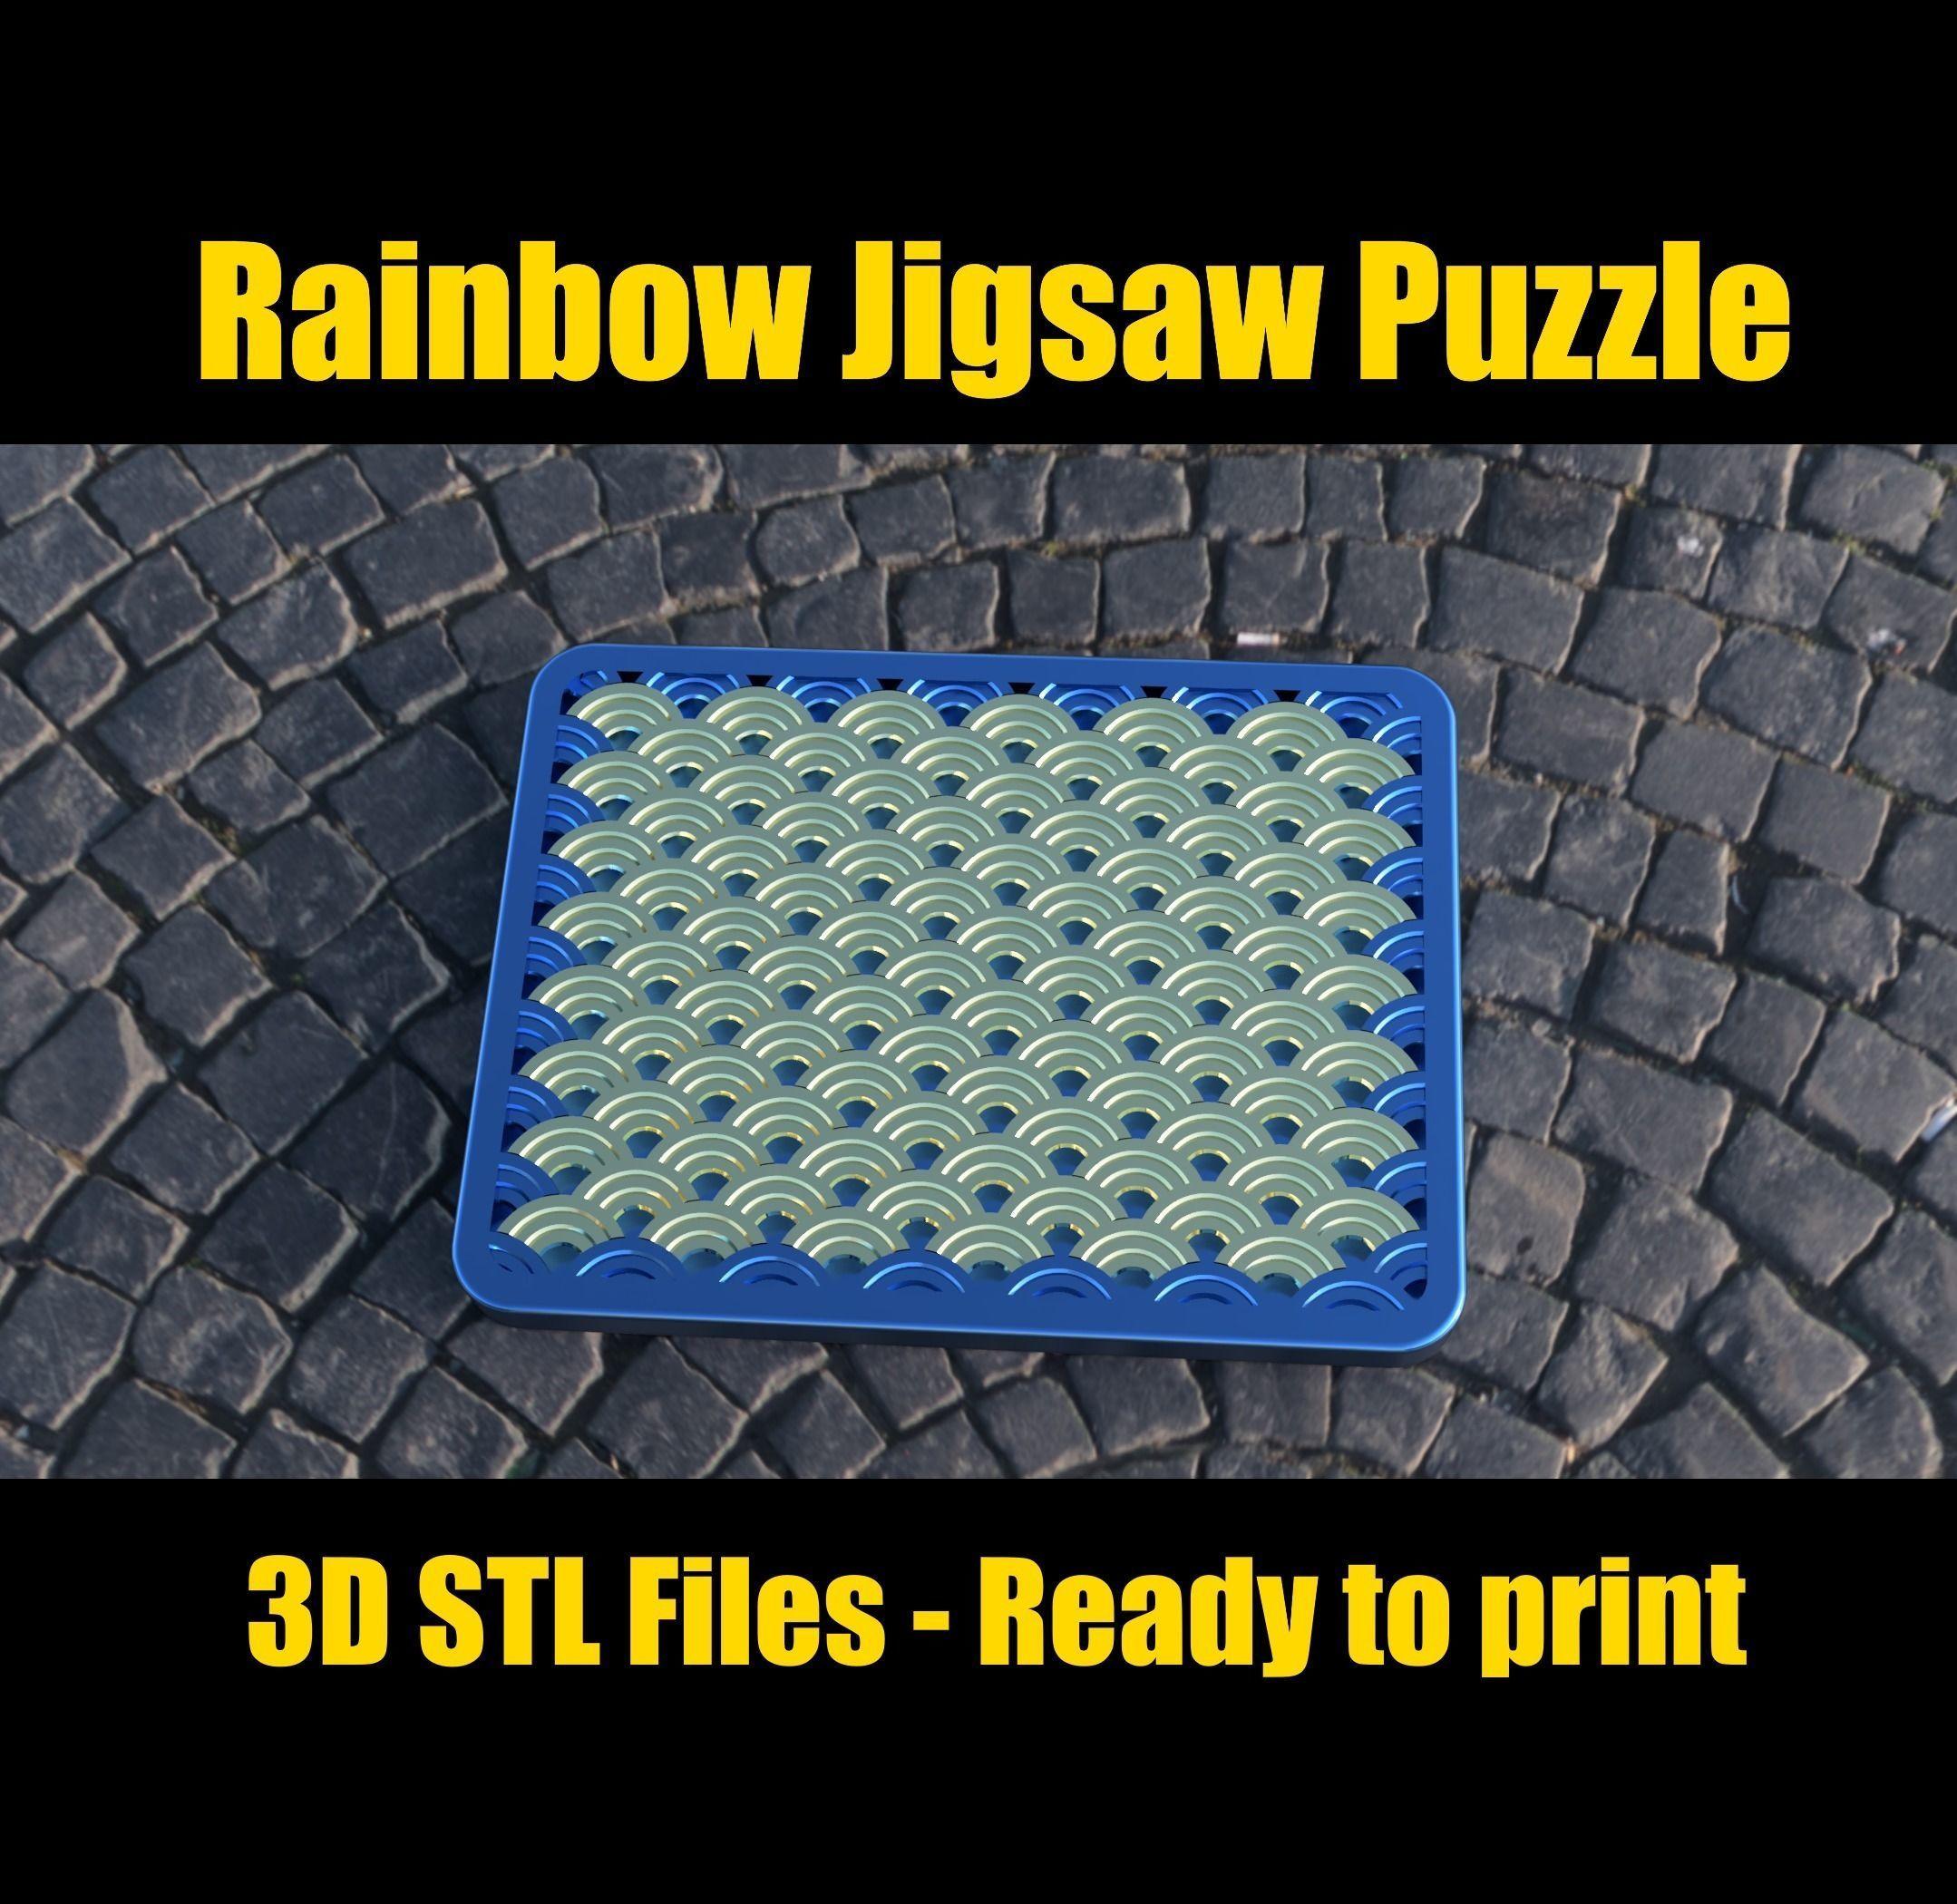 Rainbow Jigsaw Puzzle